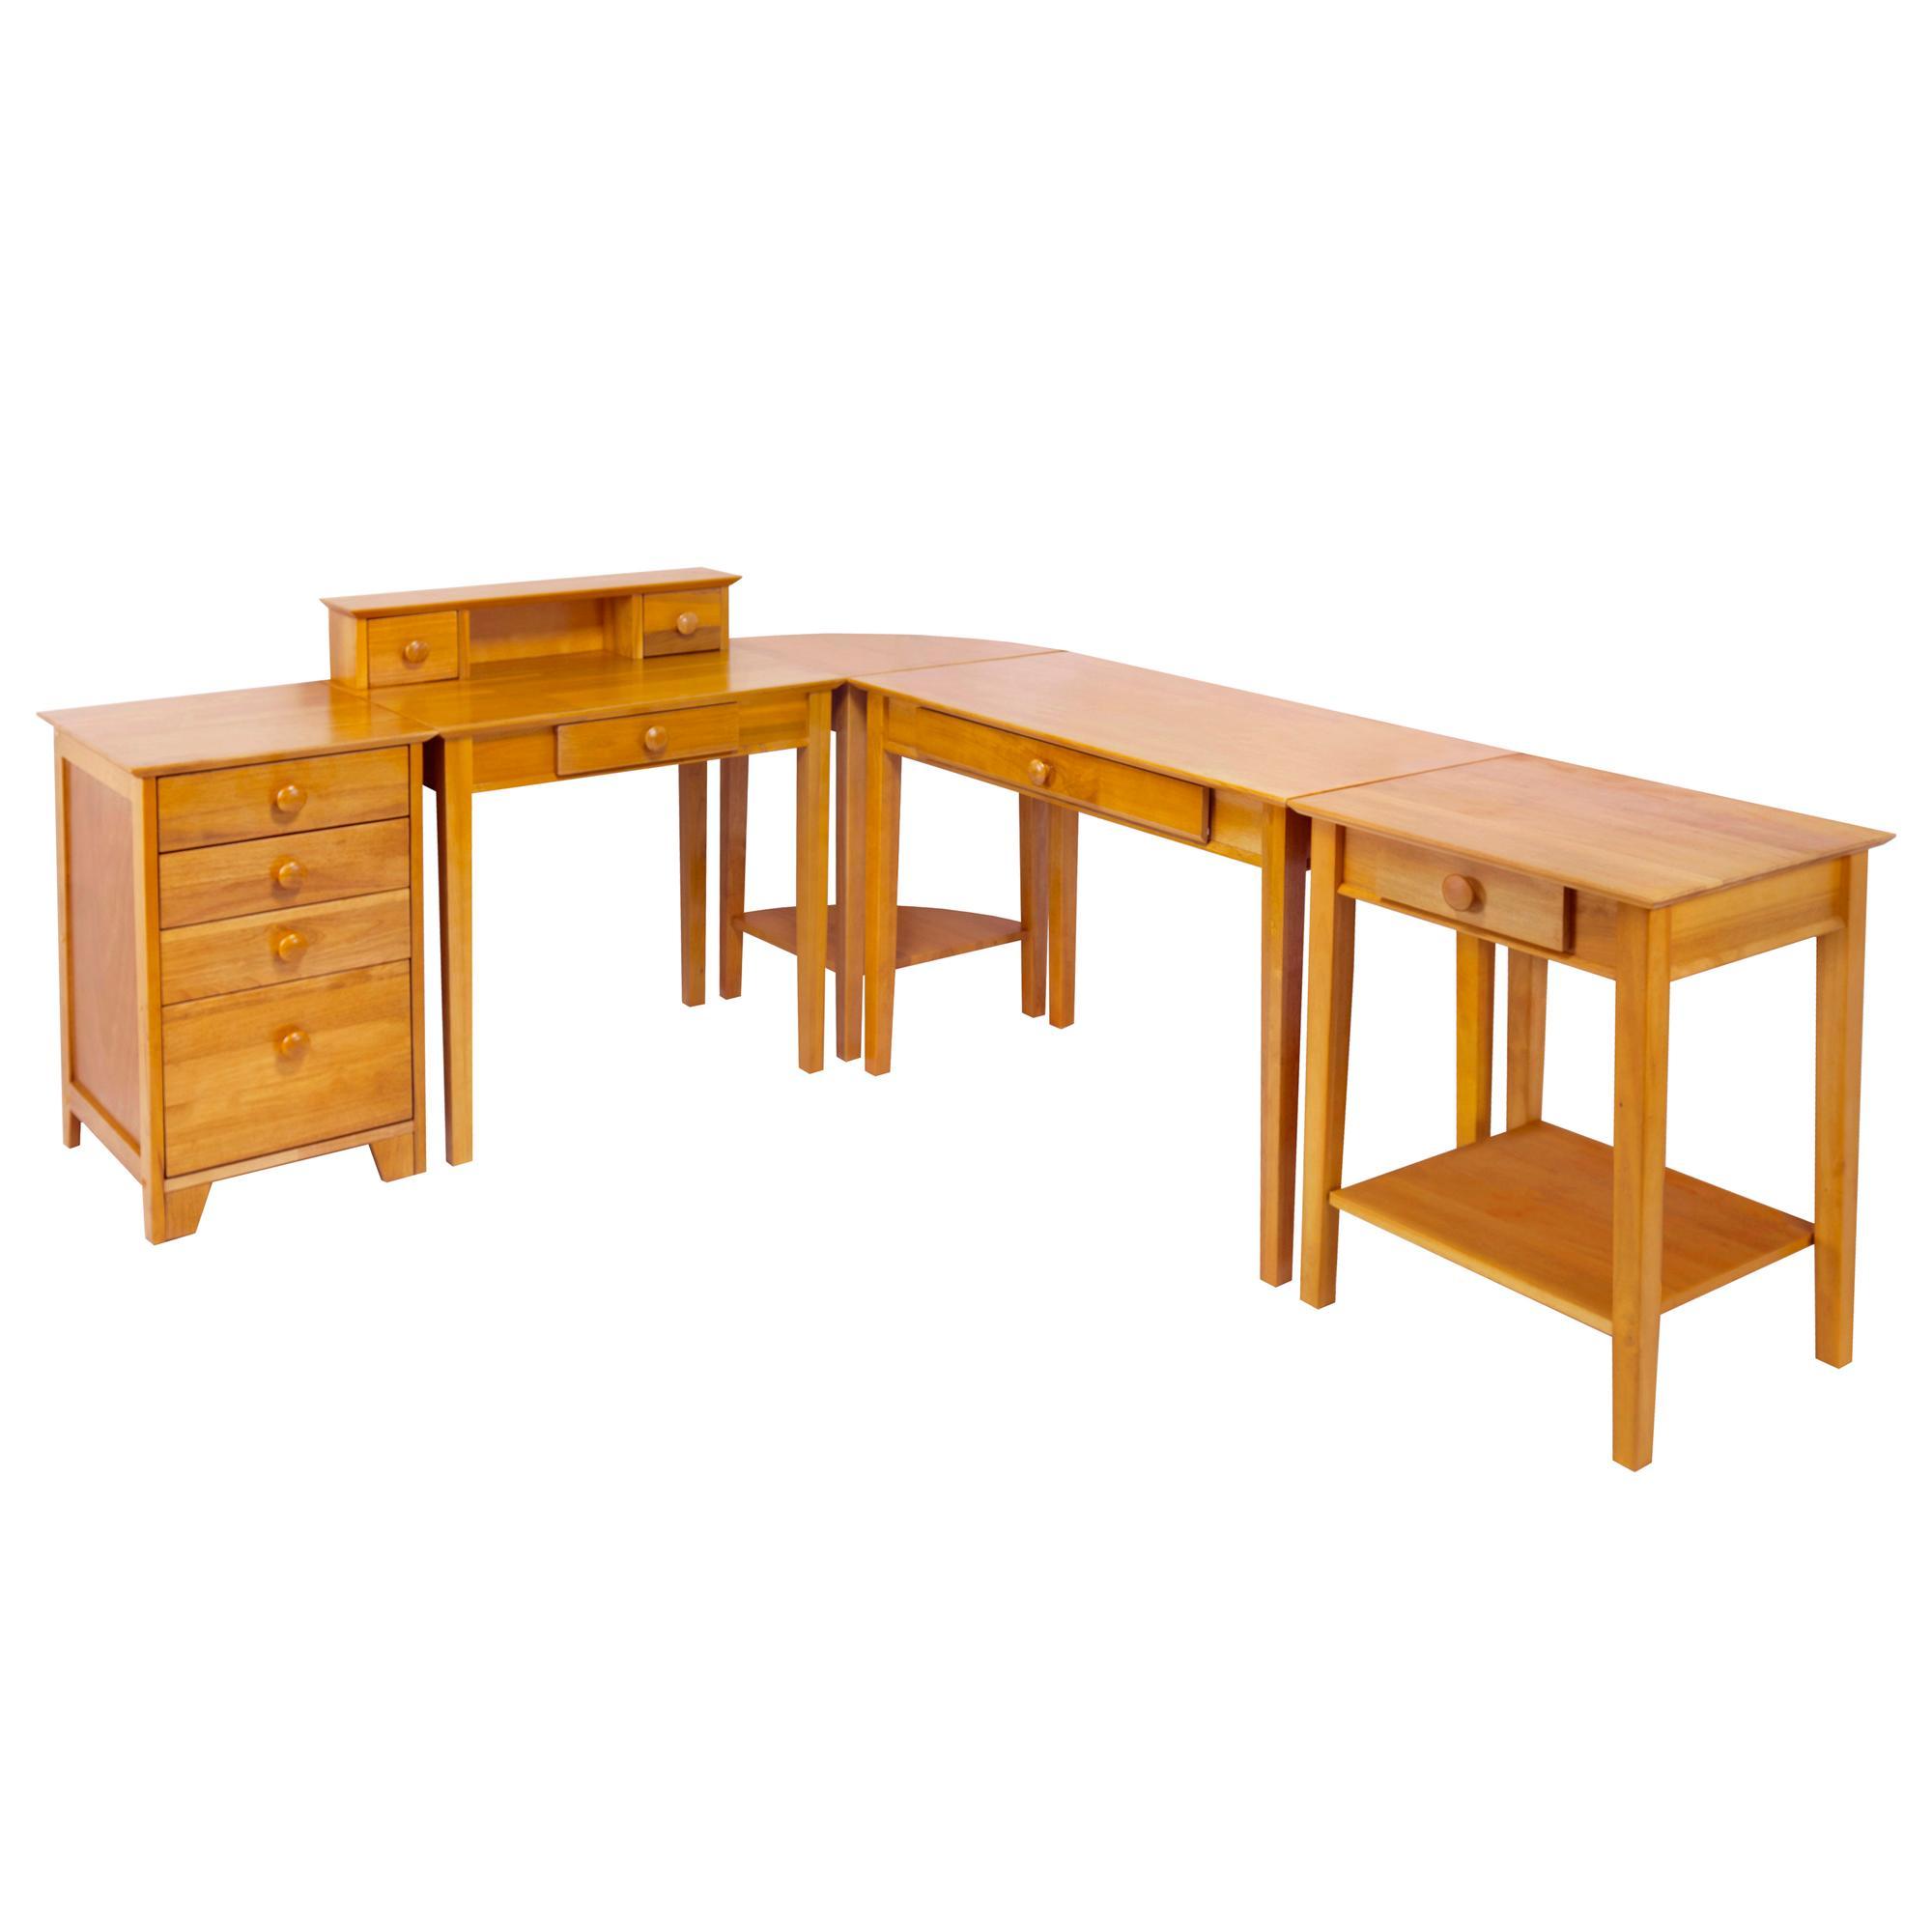 Kitchen Office Furniture: Amazon.com: Winsome Studio Home Office Furniture Set